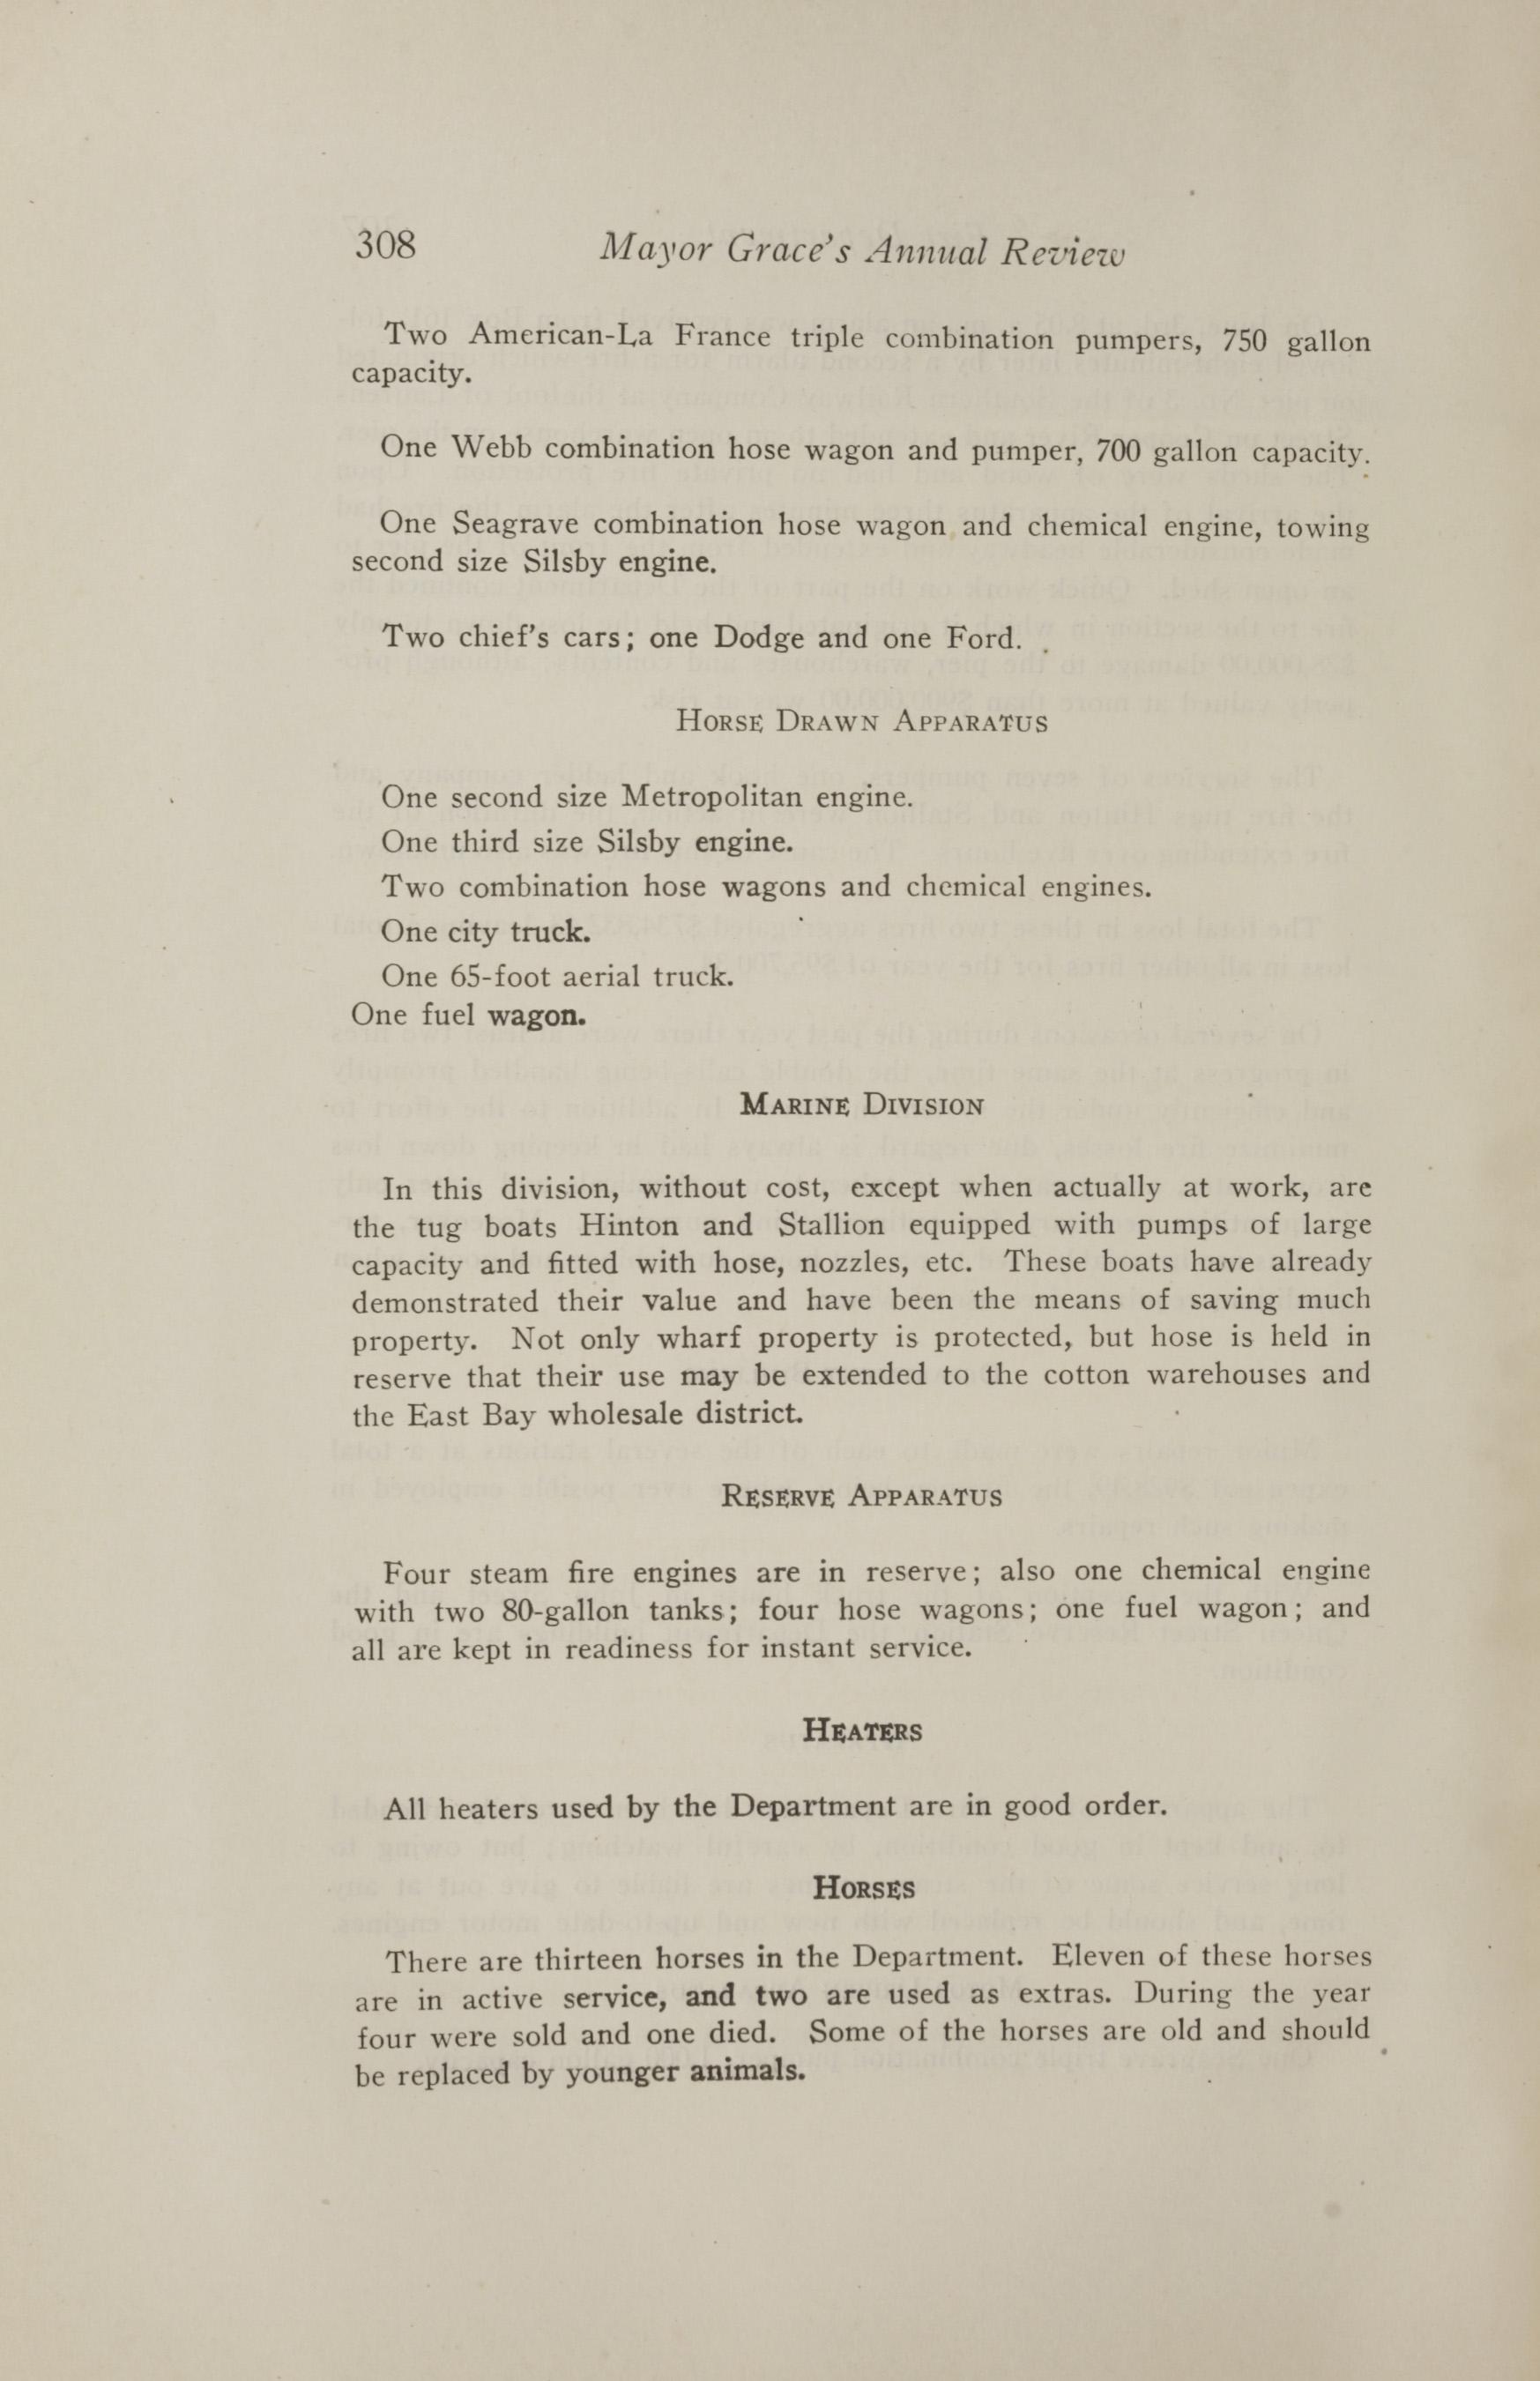 Charleston Yearbook, 1921, page 308